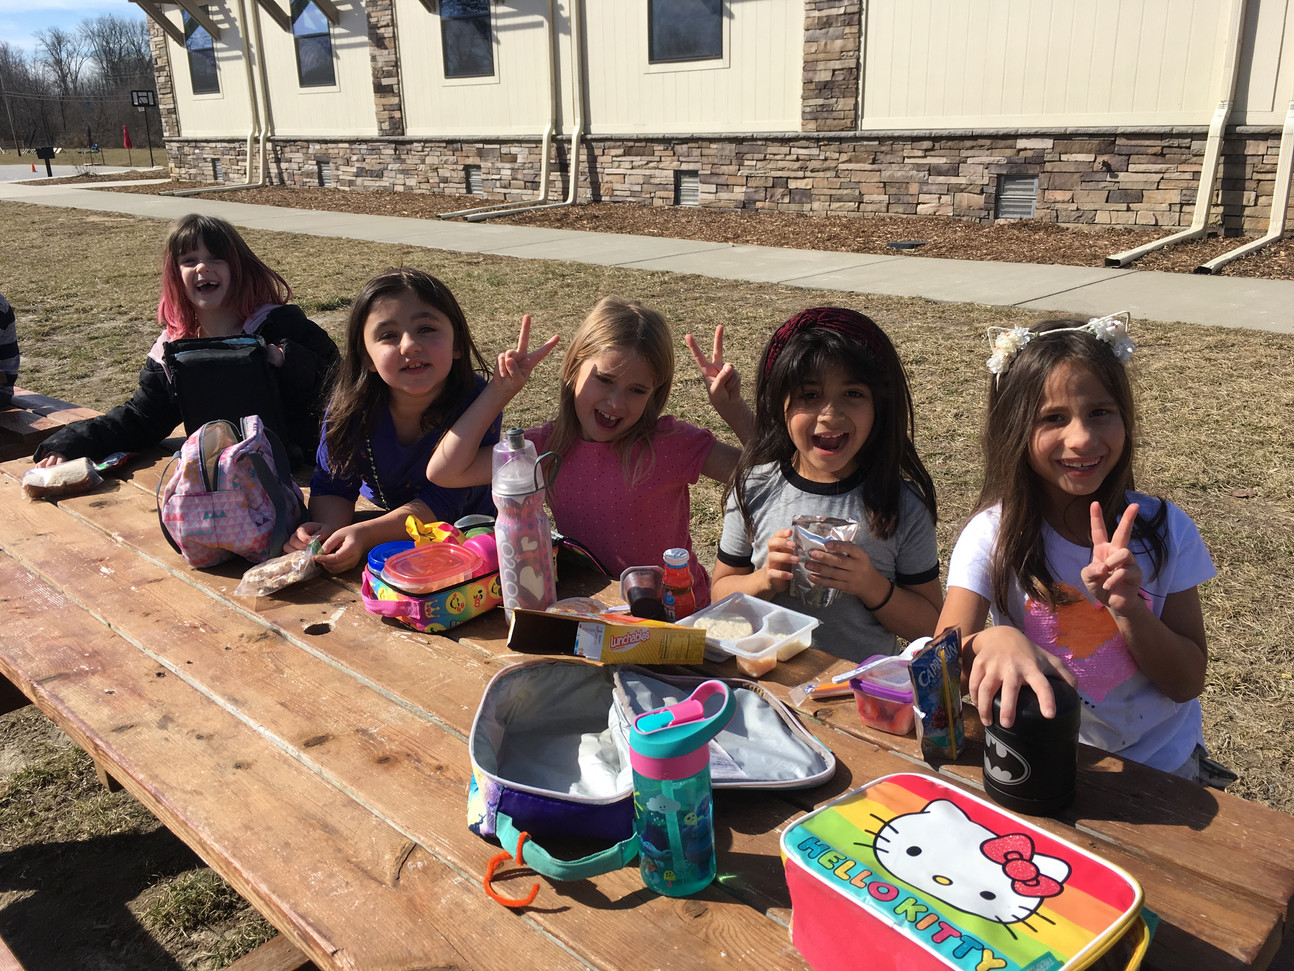 FernLeaf Community Charter School Social and Emotional Learning